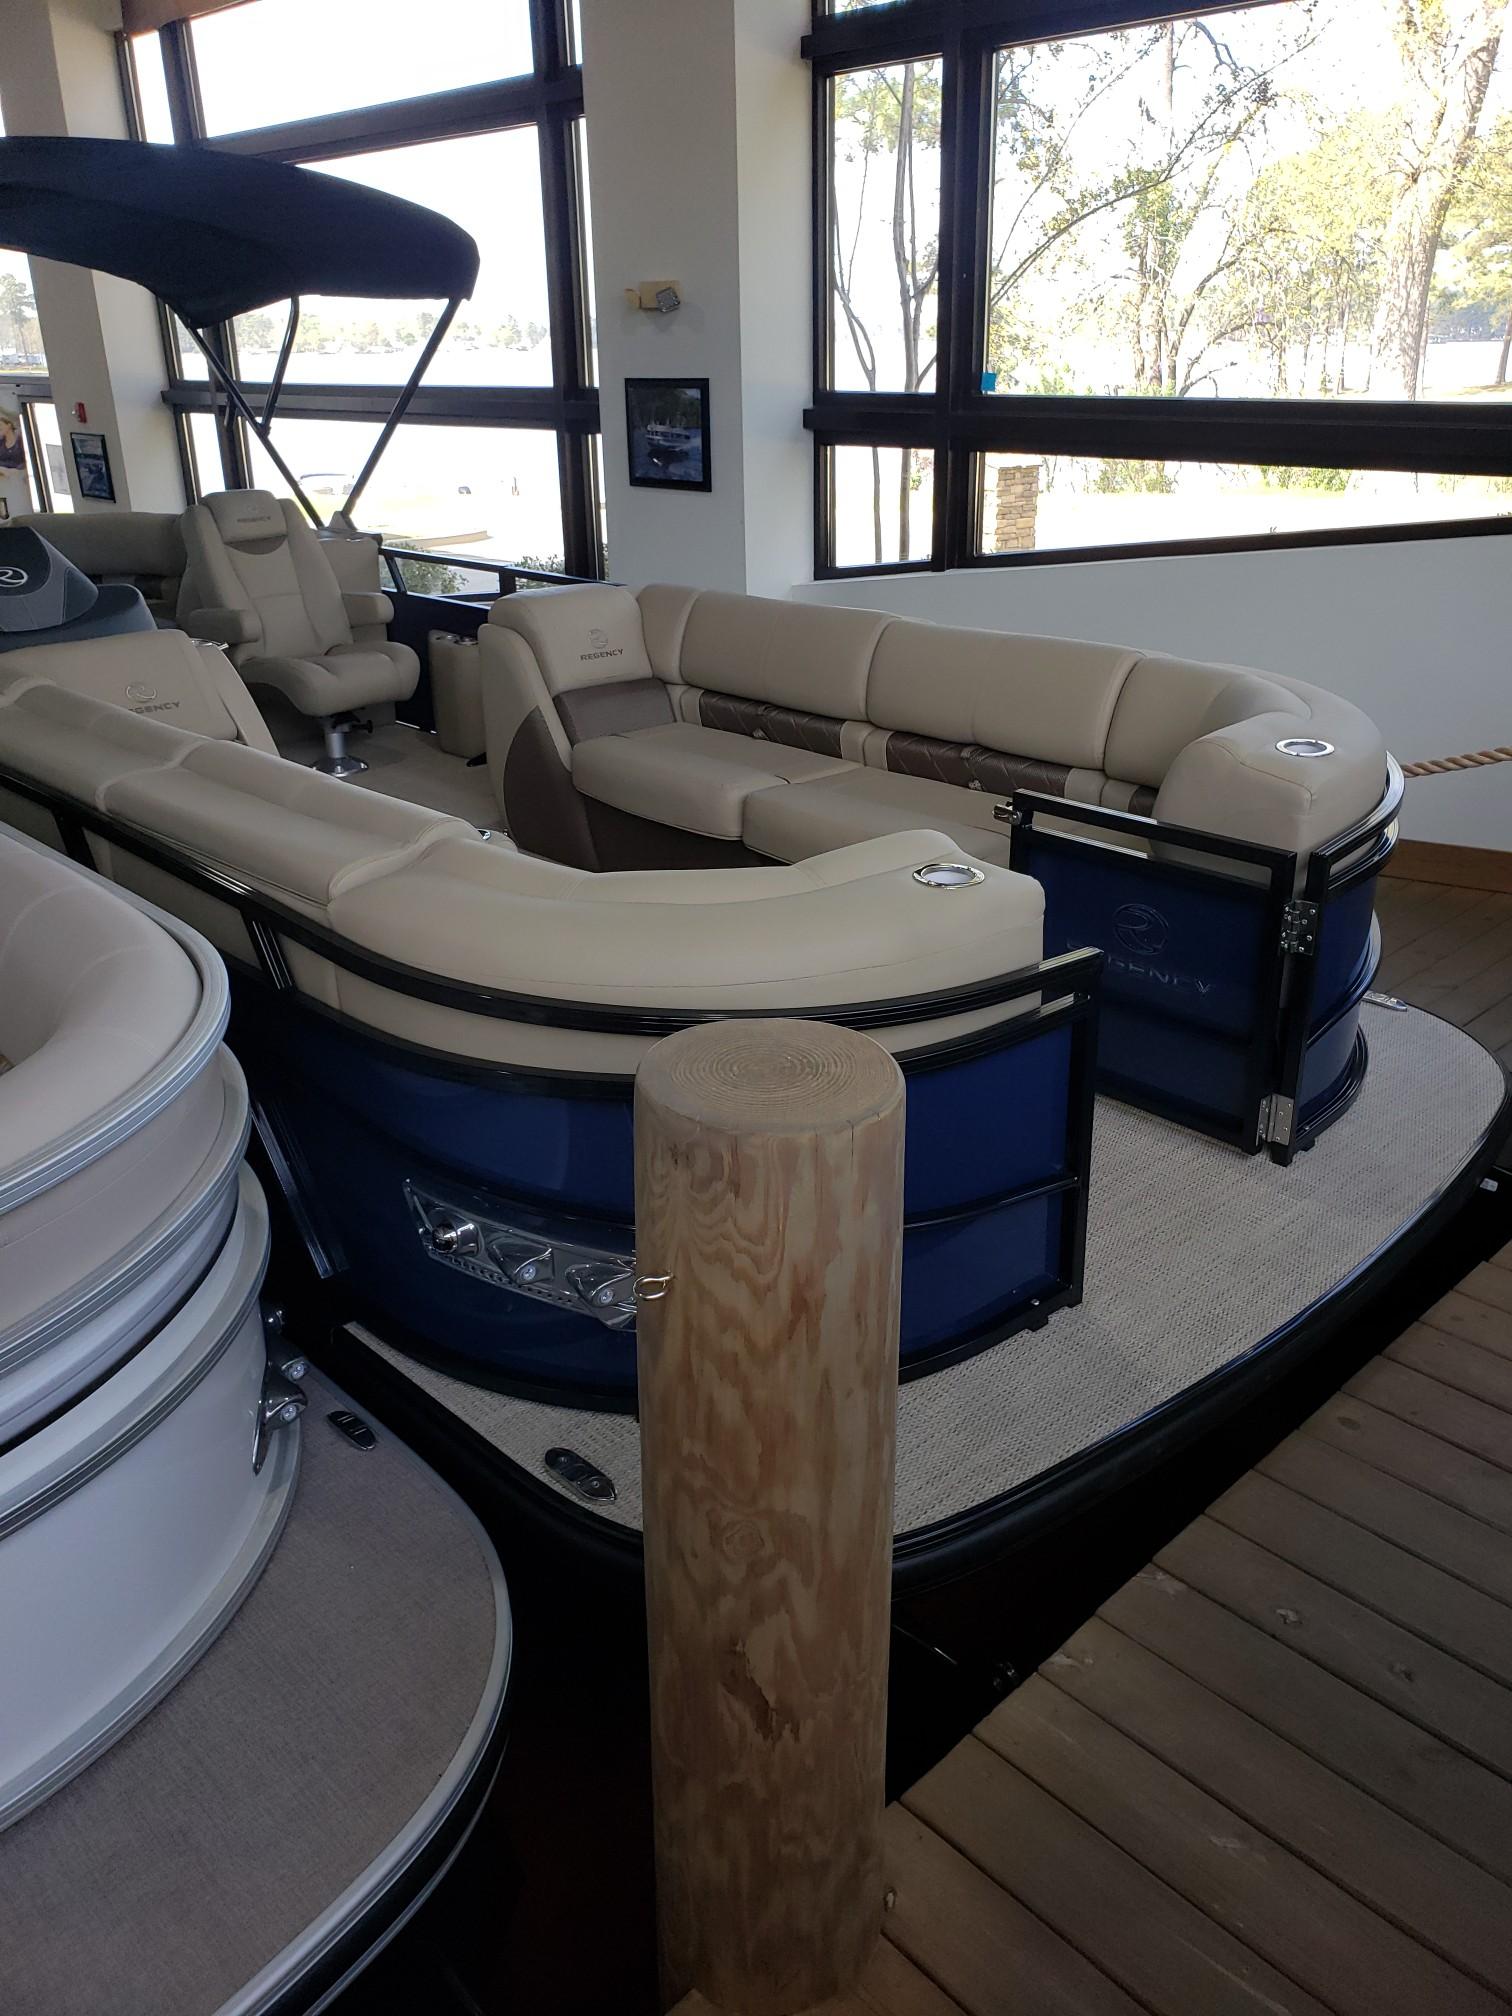 2020 Regency boat for sale, model of the boat is 250 LE3 w/300L Verado & Image # 22 of 27